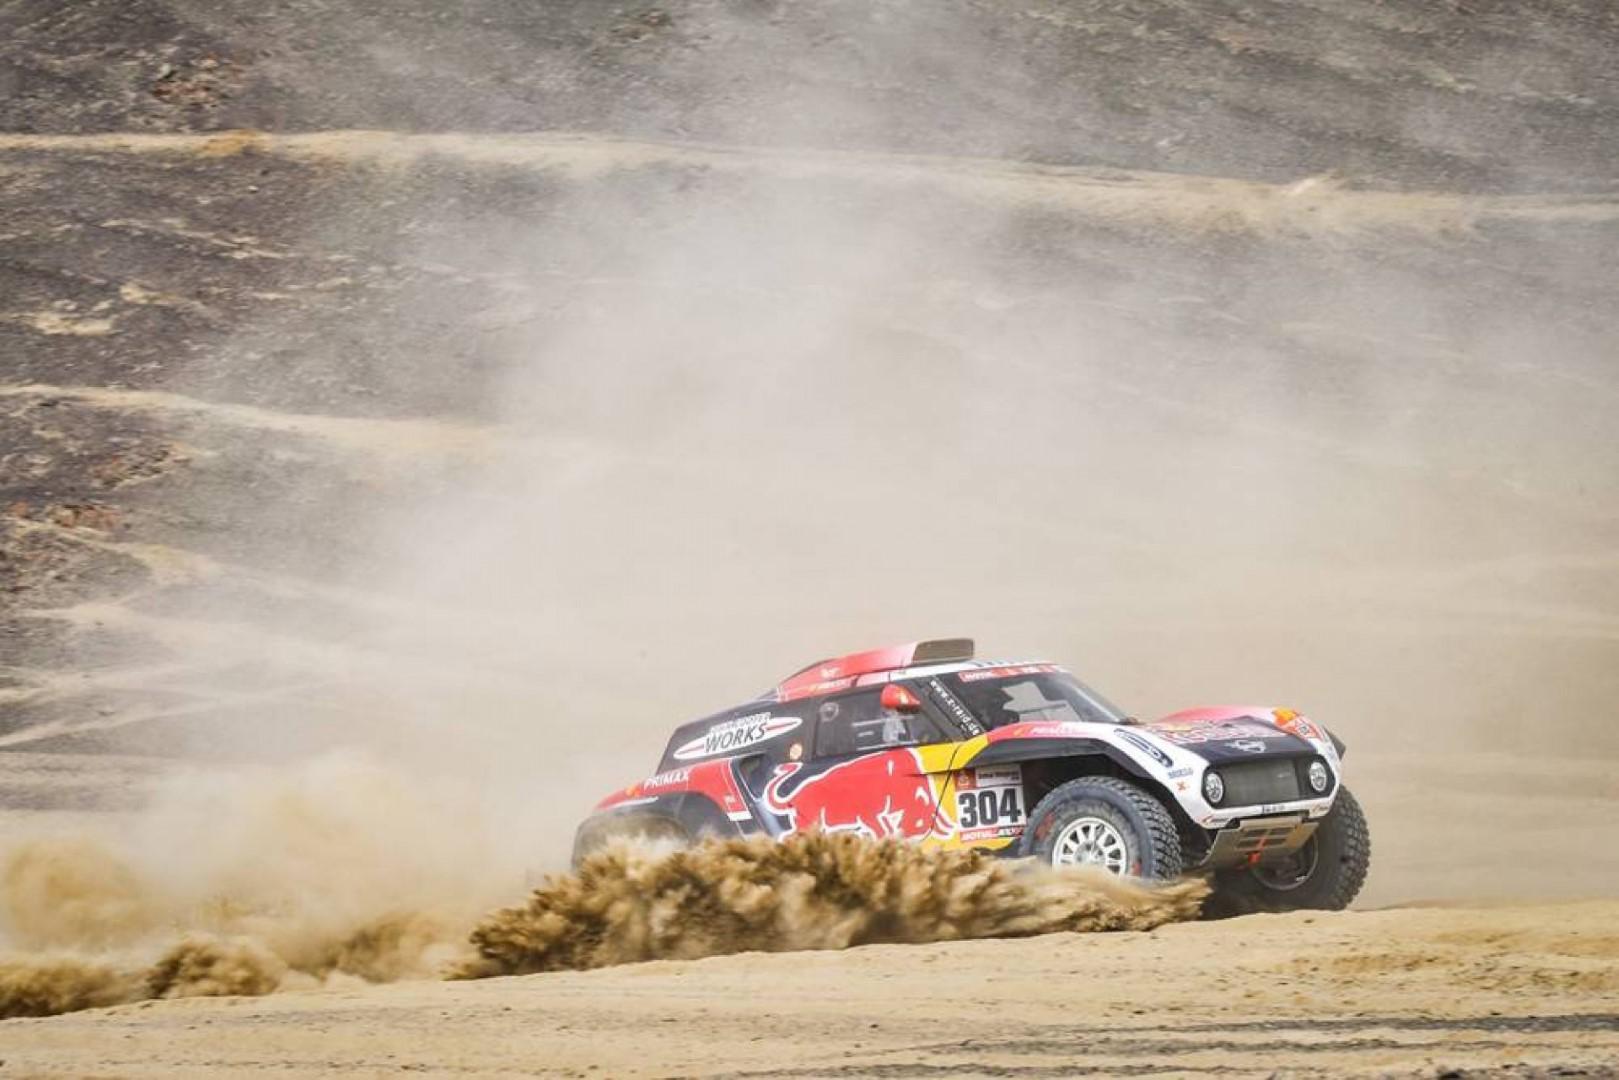 Dakar 2019: Peterhansel domine la troisième journée